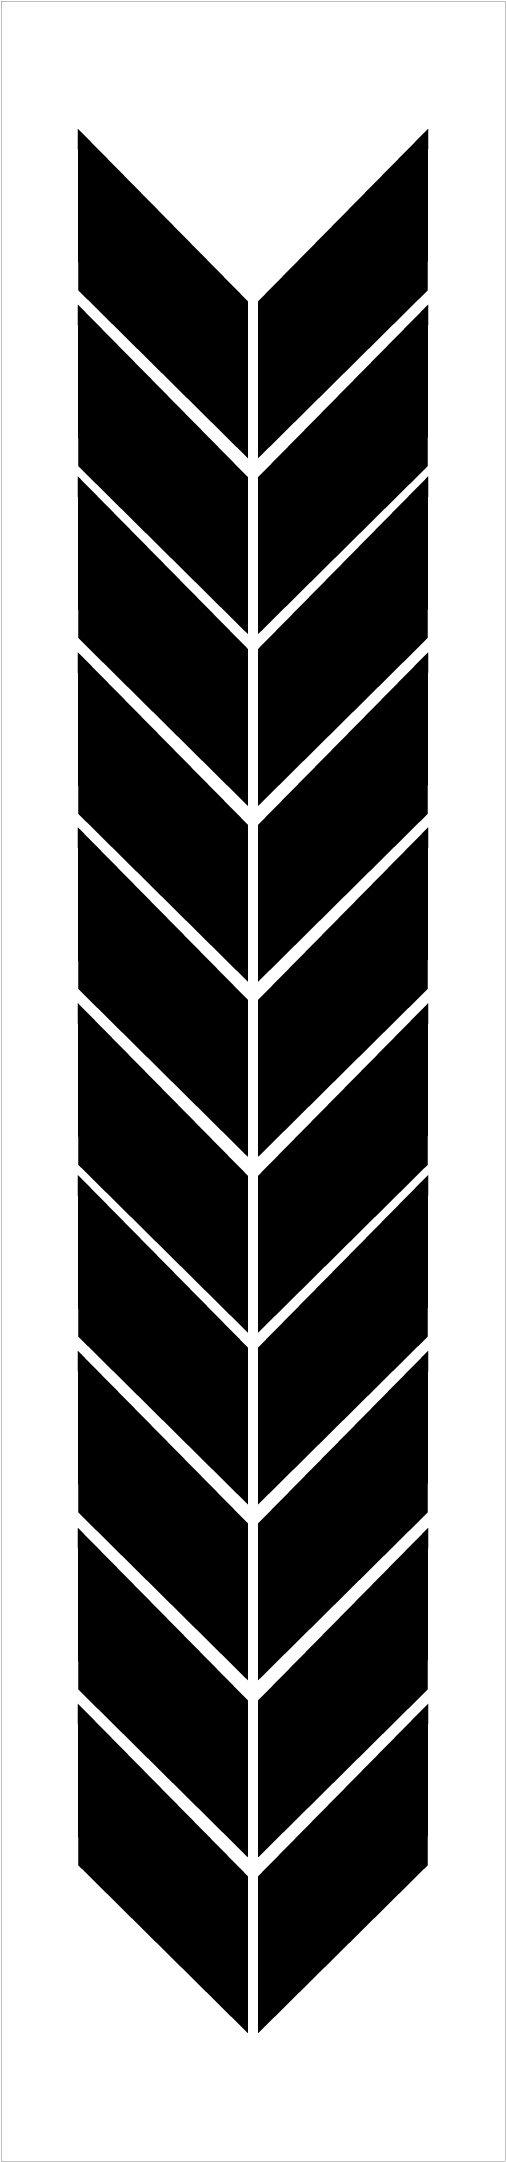 Chevron Band Pattern Stencil by StudioR12   Craft DIY Arrow Backsplash Home Decor   Paint Wood Sign Border   Reusable Template   Select Size